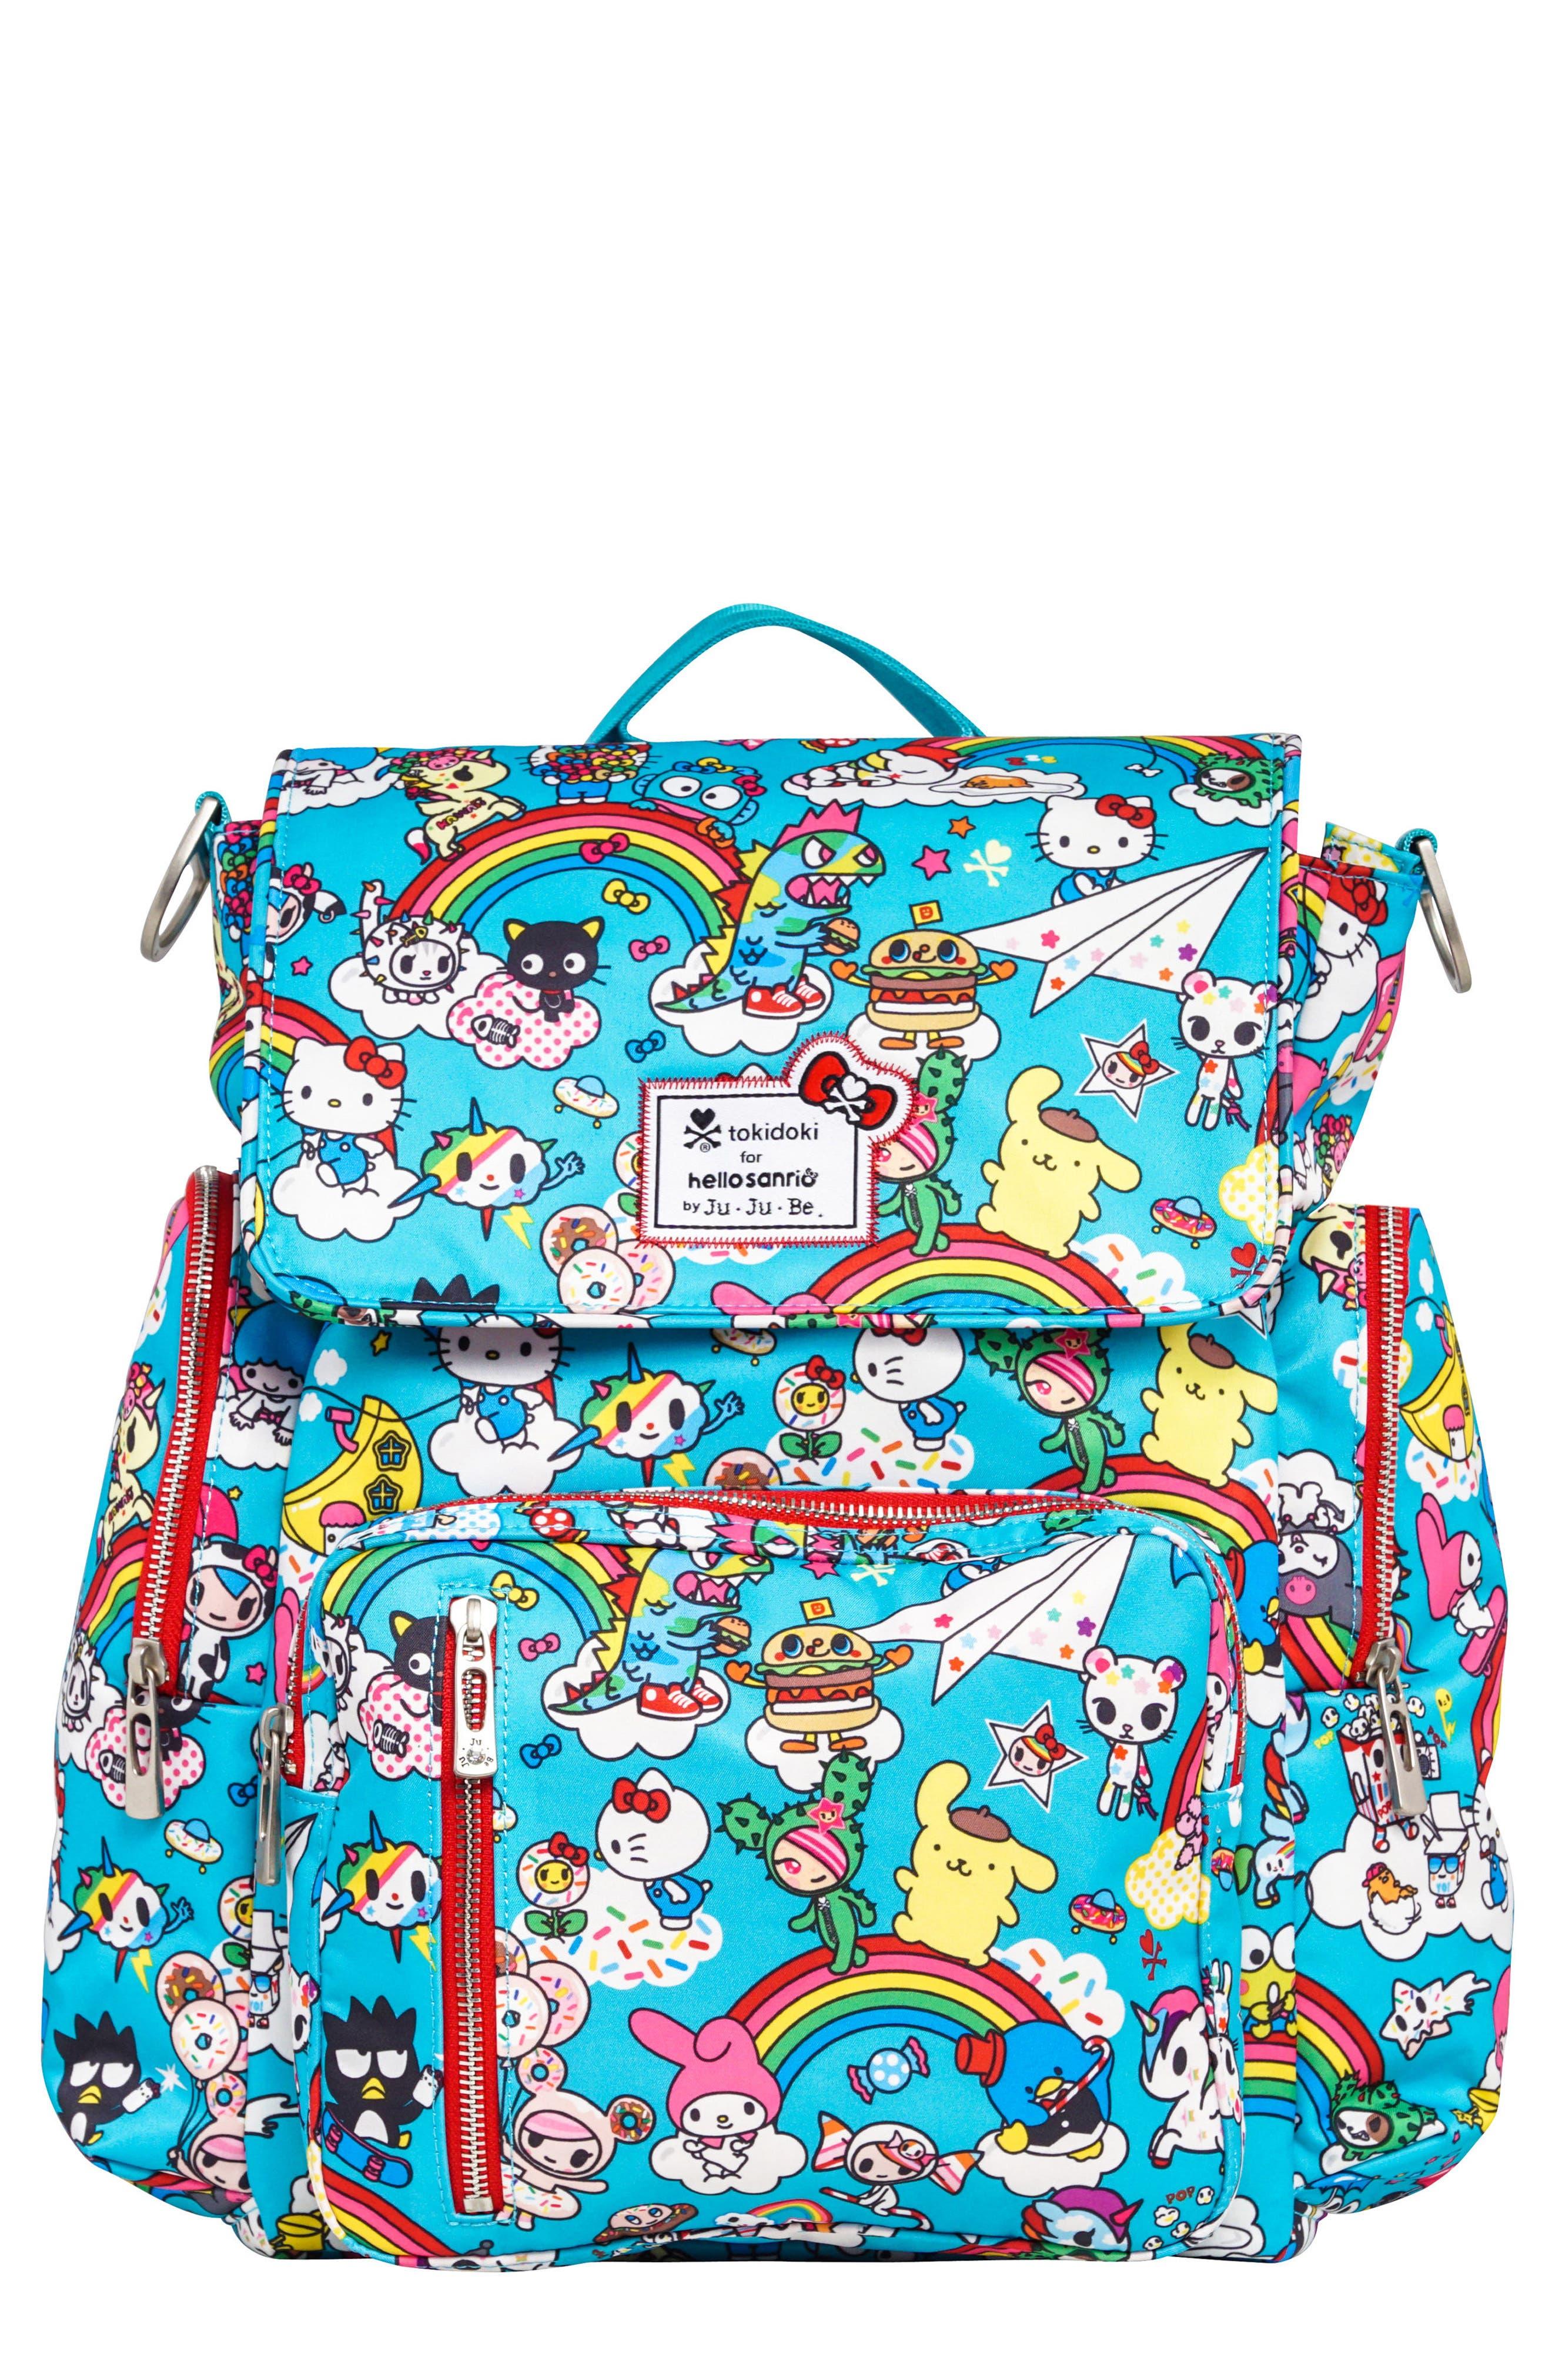 x tokidoki for Hello Sanrio Rainbow Dreams Sporty Diaper Backpack,                             Main thumbnail 1, color,                             Rainbow Dreams